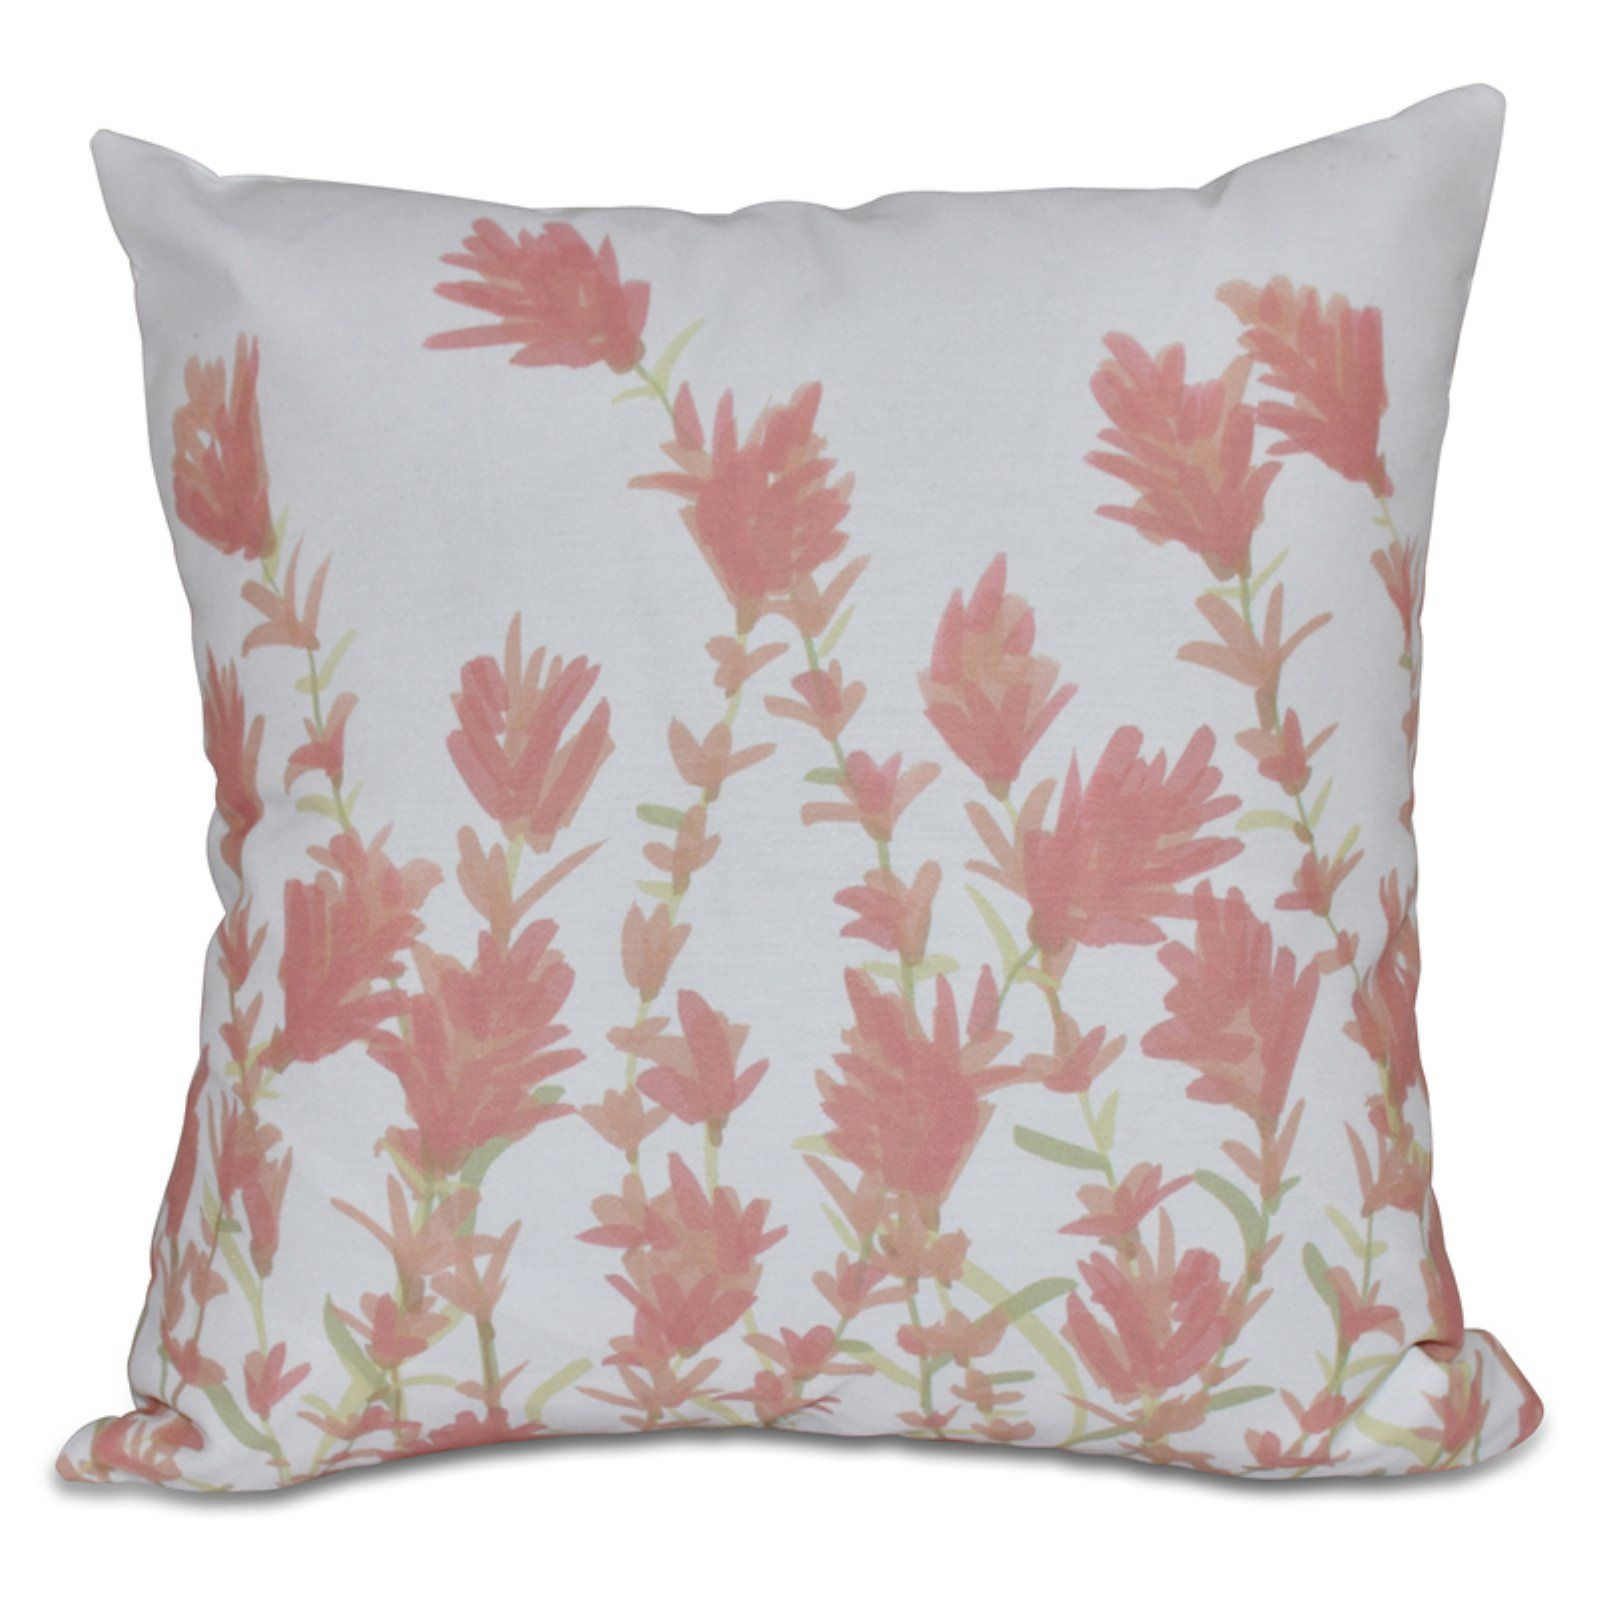 E By Design Botanical Blooms Lavender Decorative Pillow In 2020 Floral Throw Pillows Floral Pillows Lavender Pillows